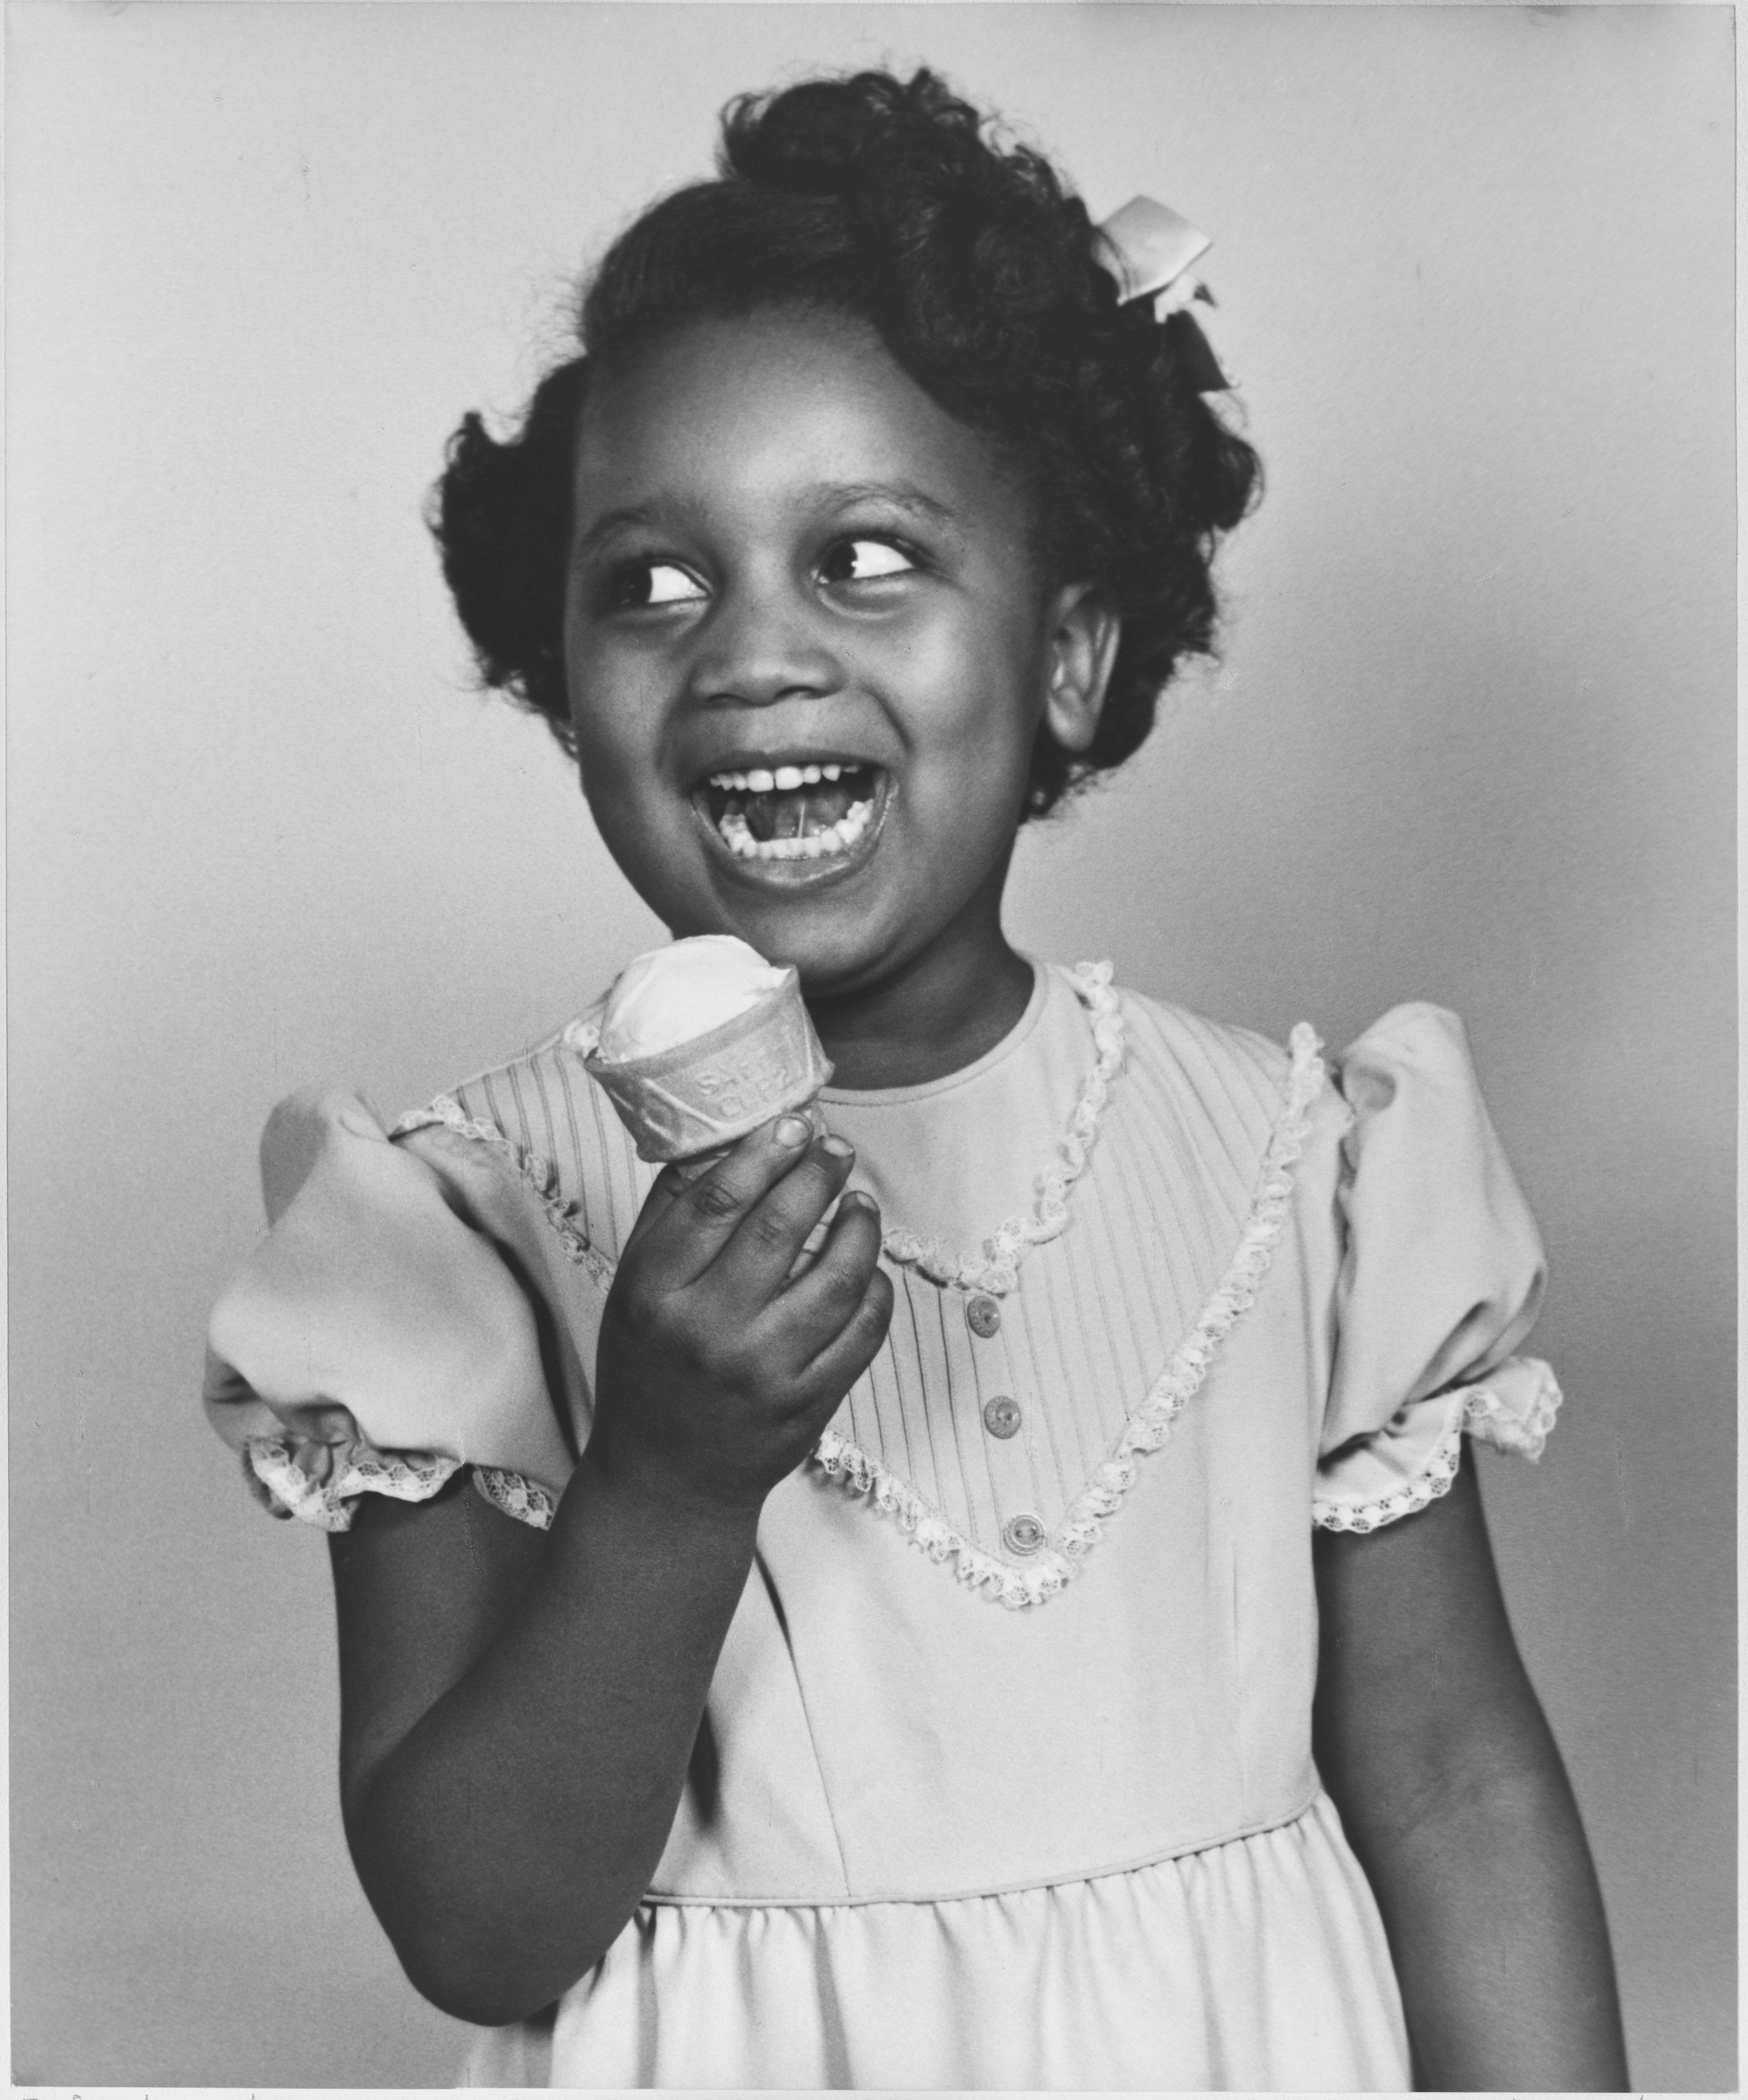 African American Portraits - Girl & Ice Cream